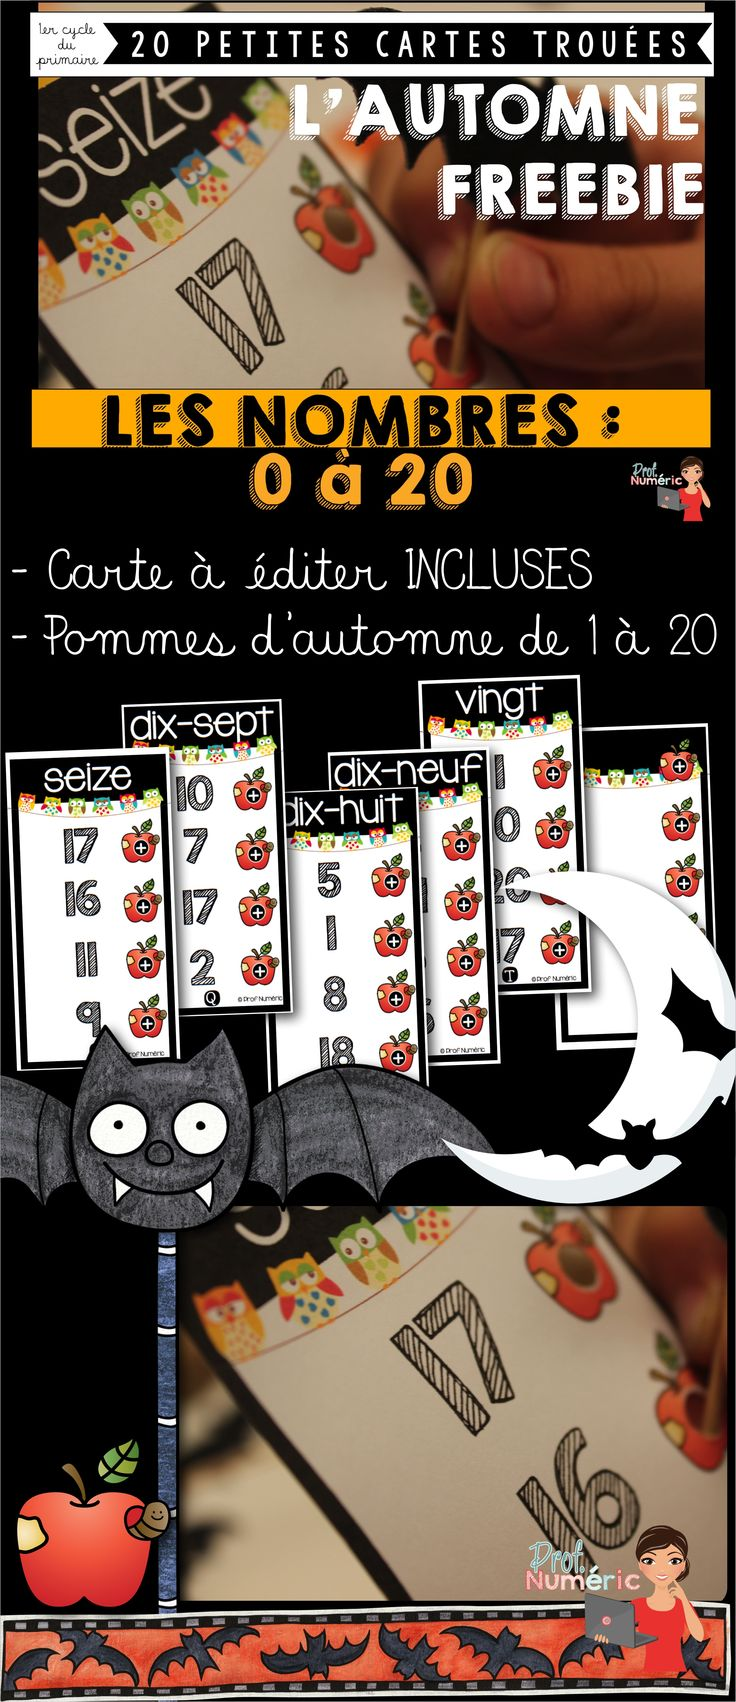 Bilingual dolphin counting card 6 clipart etc - 20 Cartes Trou Es Les Nombres De 1 20 Freebie Th Me De L